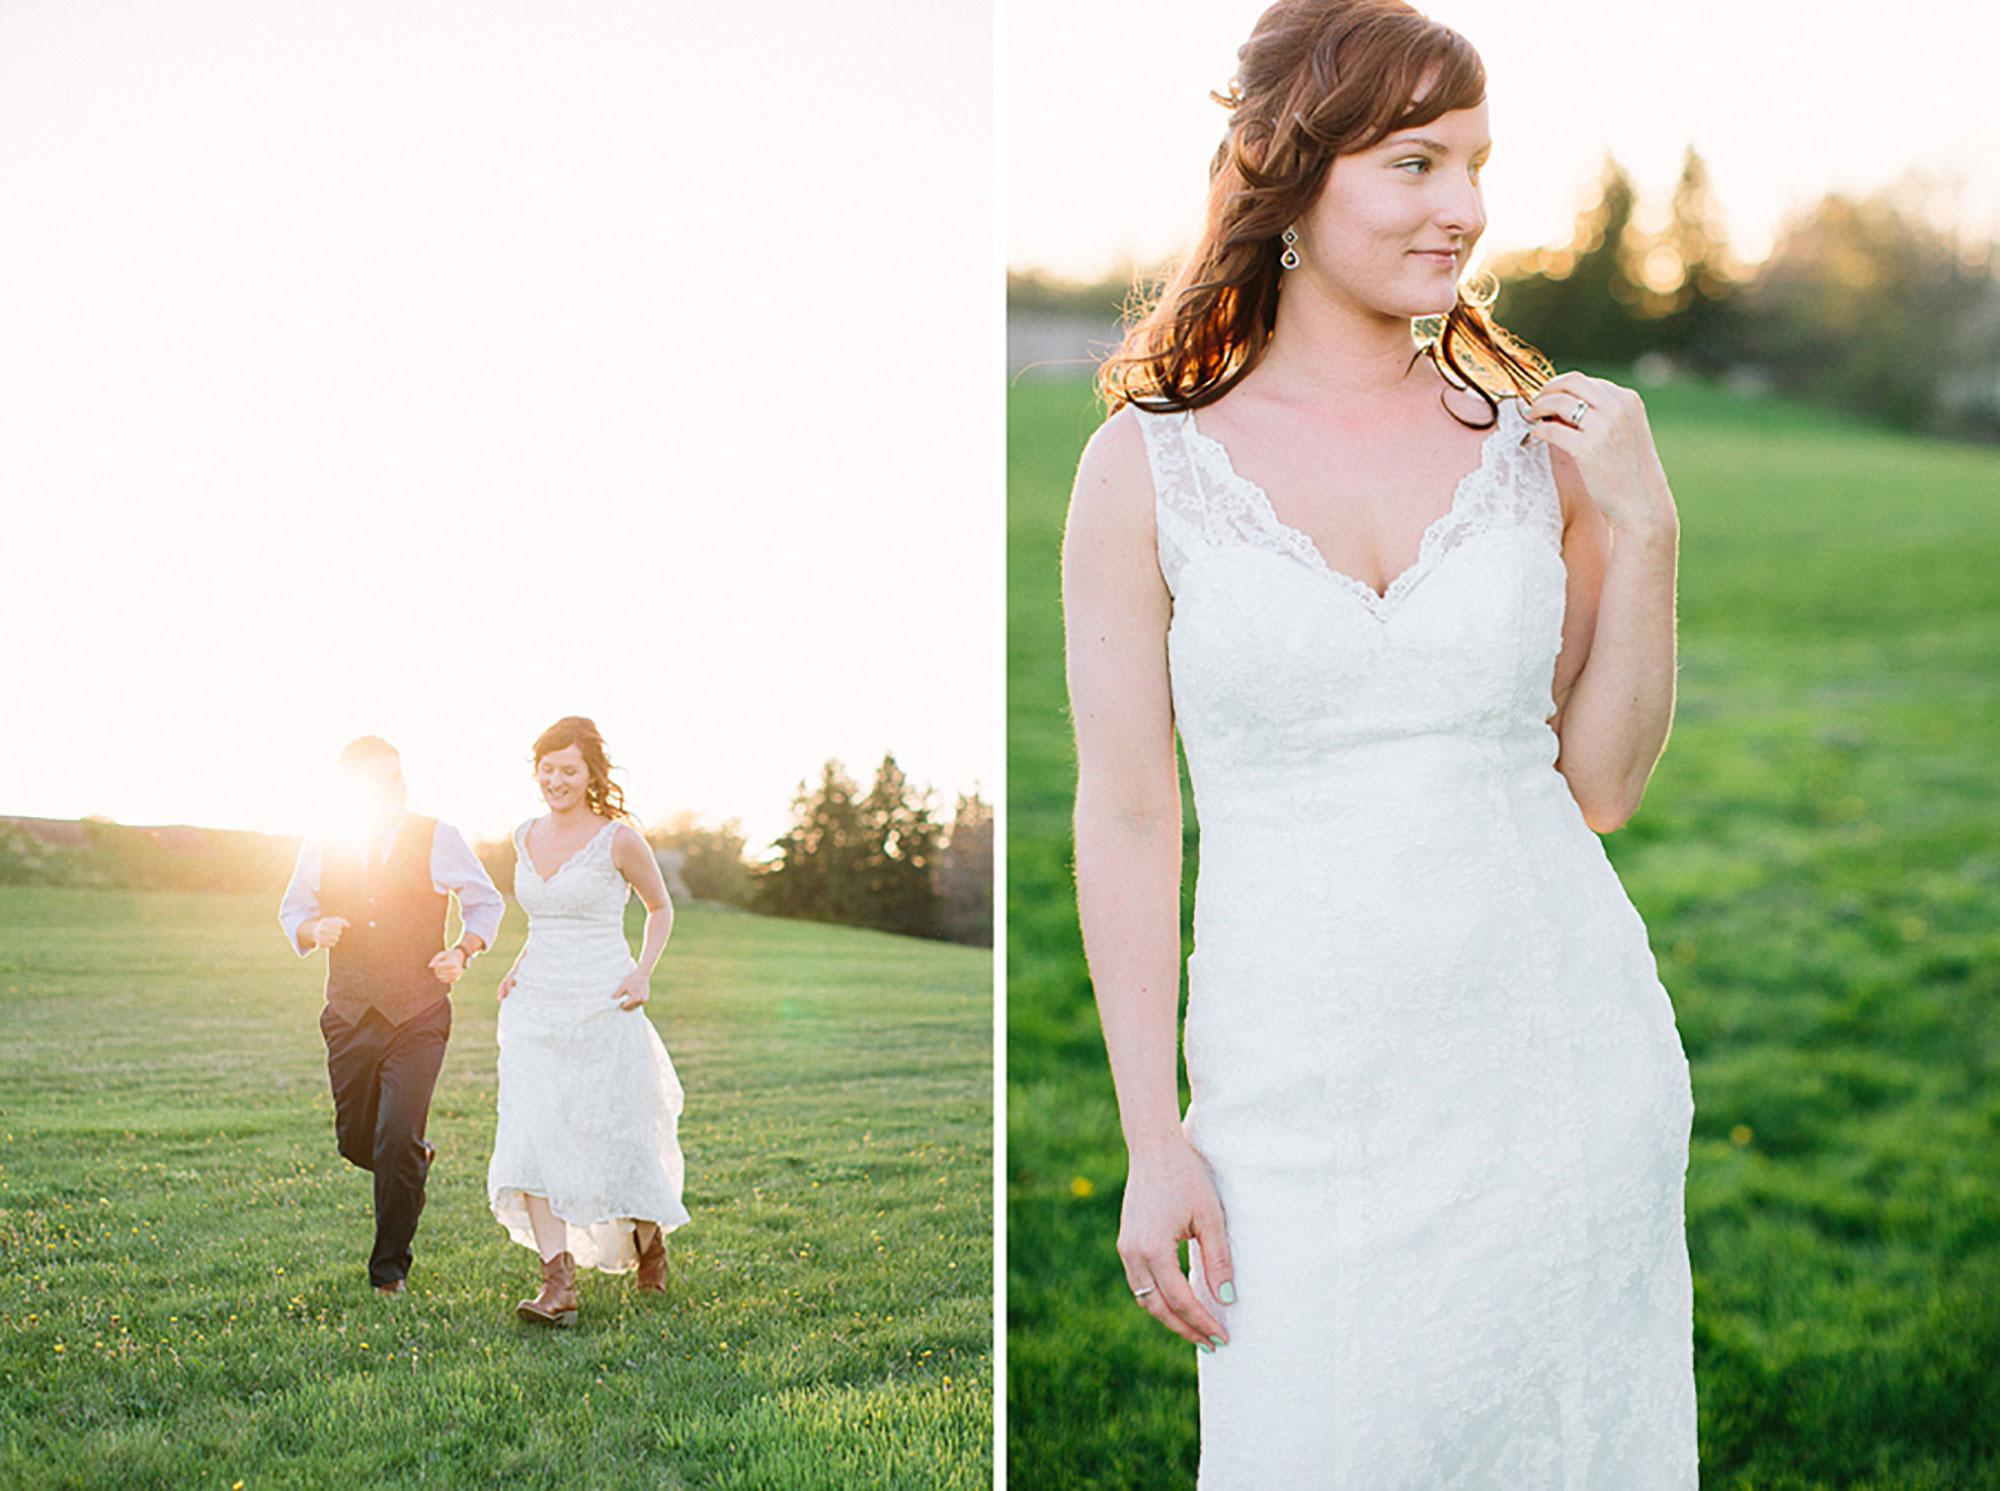 Navy-Hall-Wedding-Vineyard-Bride-Photo-By-Andrew-Mark-Photography-048.jpg